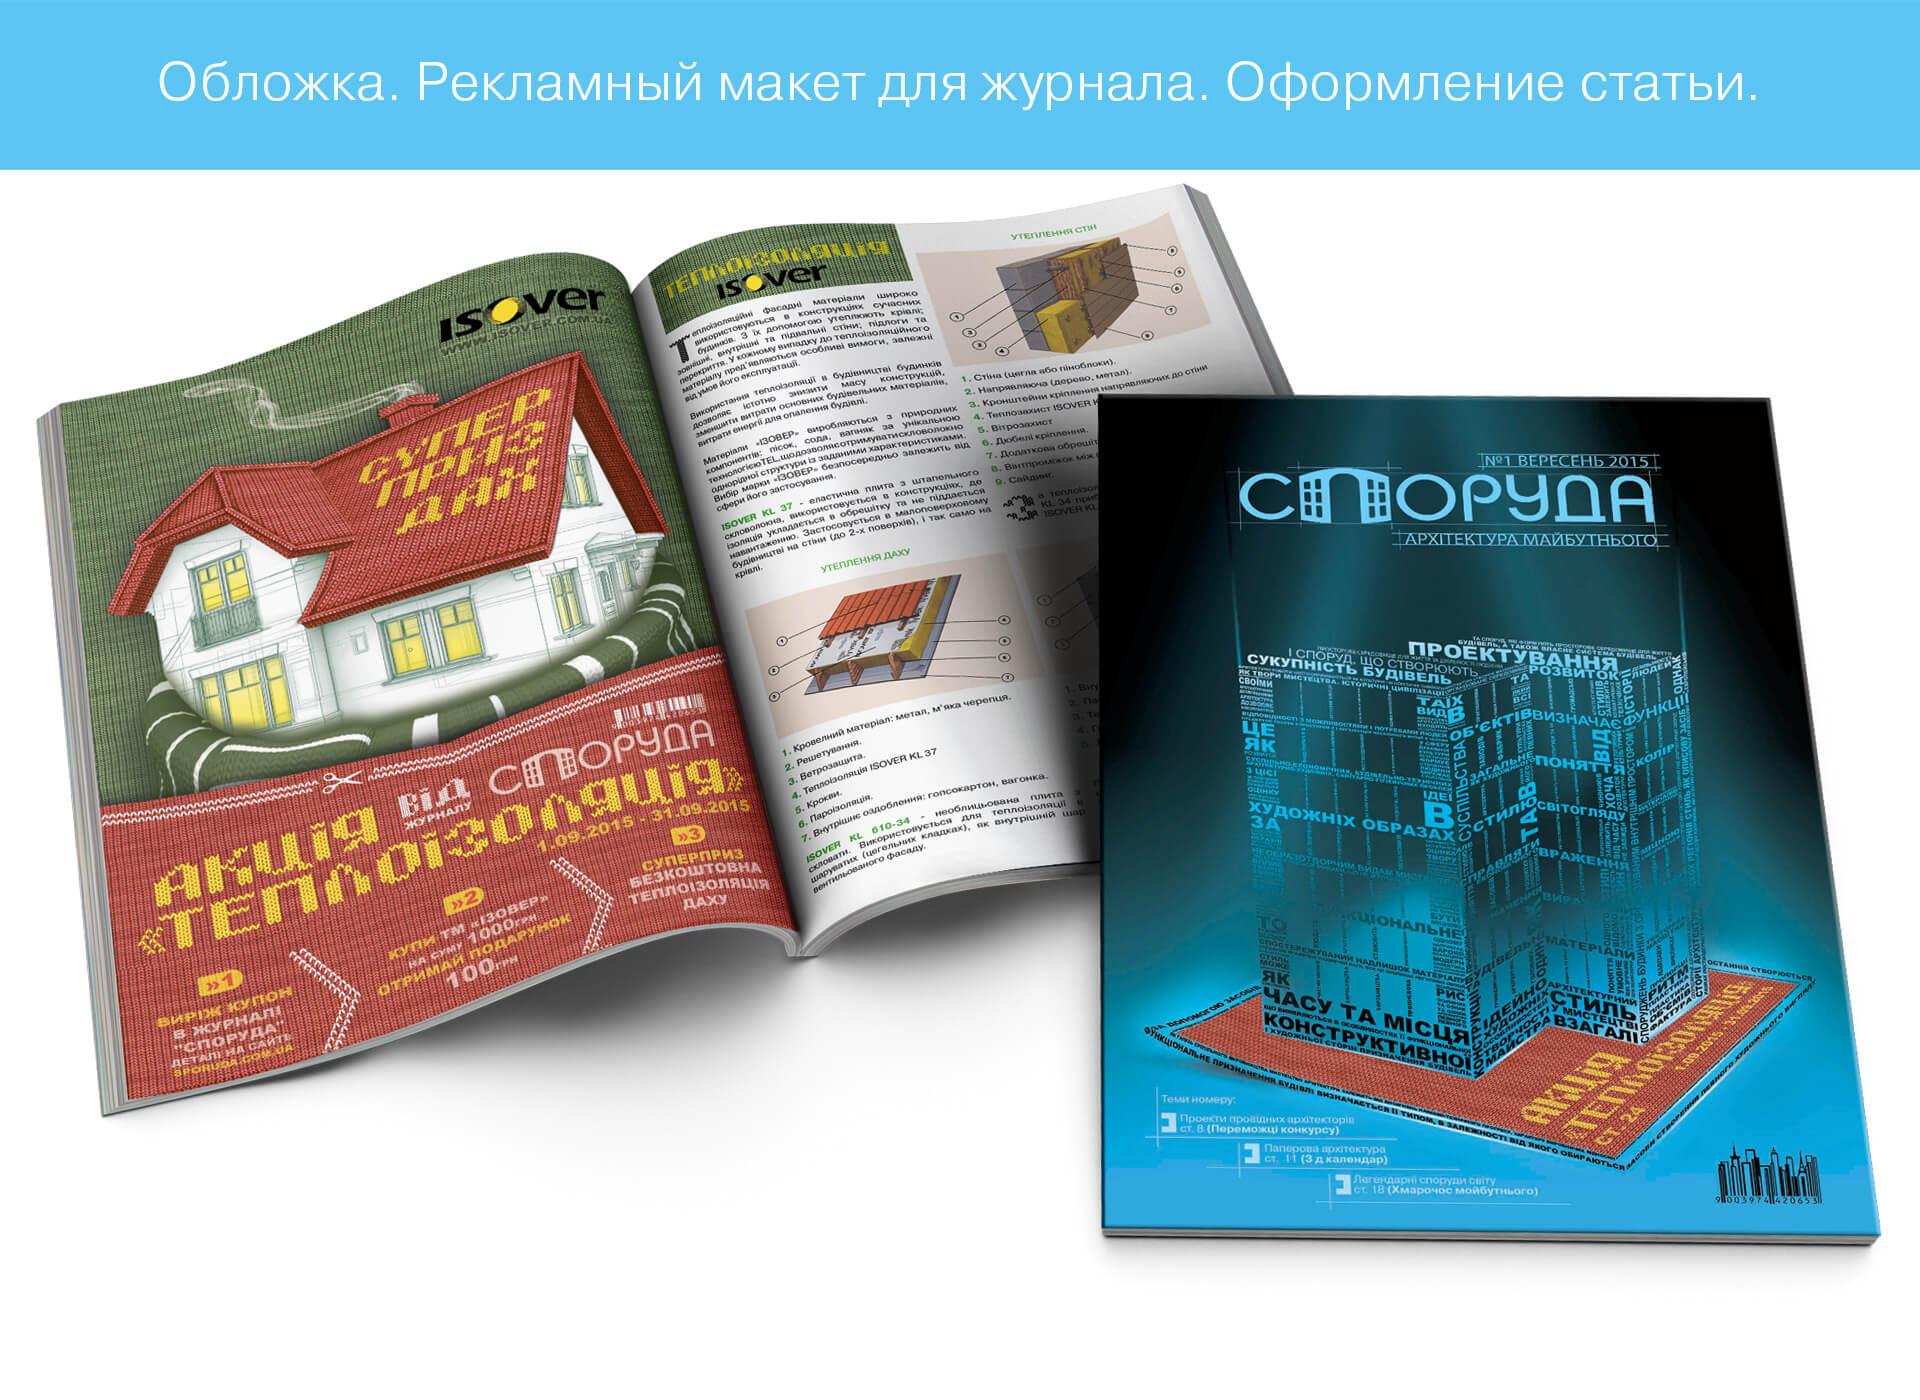 Prokochuk_Irina_architectural magazine Sporuda_аdvertising campaign_1